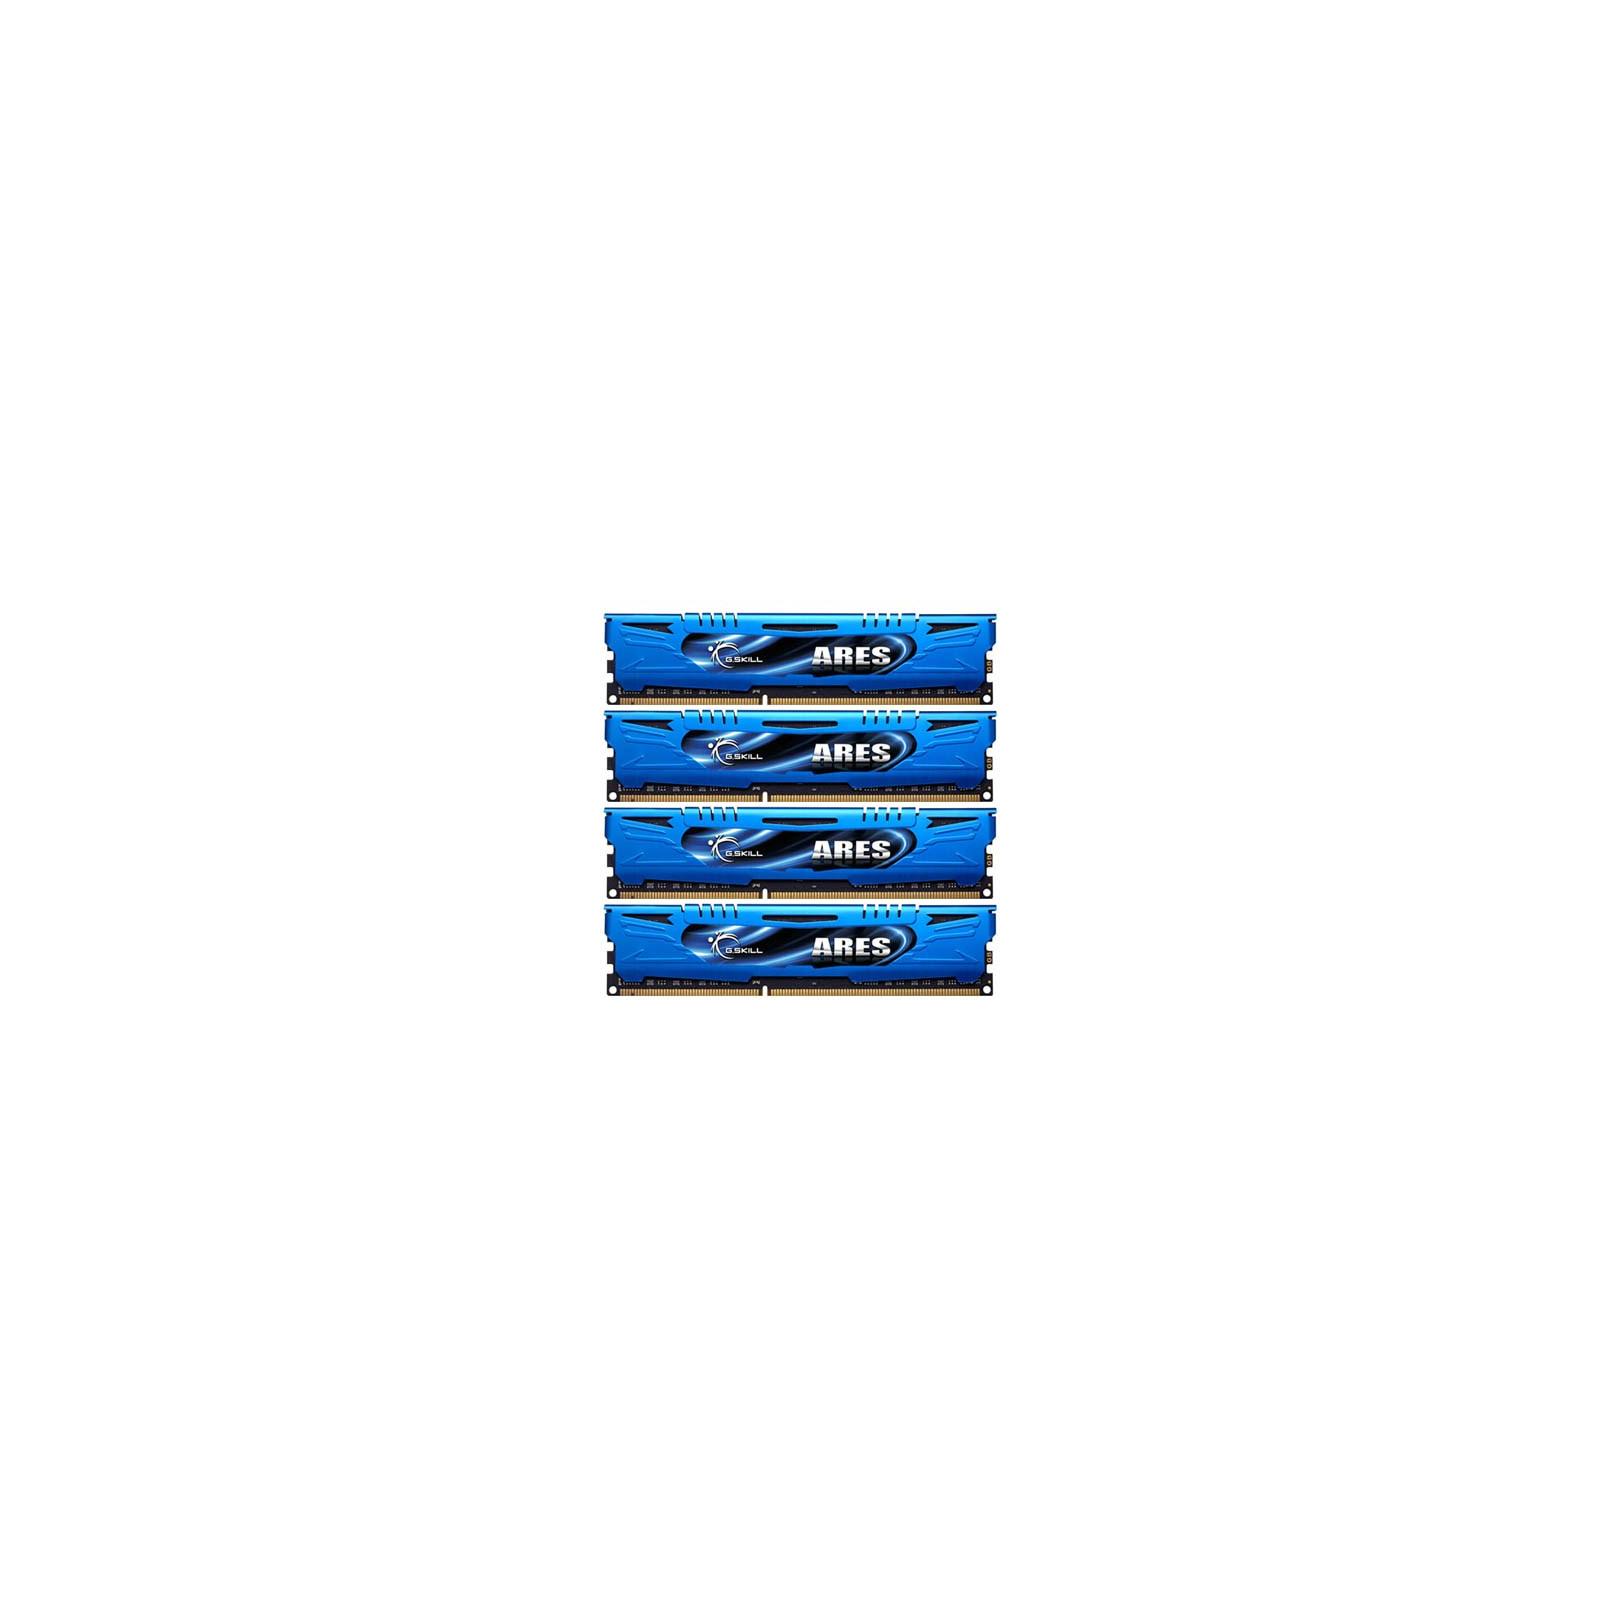 Модуль памяти для компьютера DDR3 16GB (4x4GB) 1600 MHz G.Skill (F3-1600C9Q-16GAB)